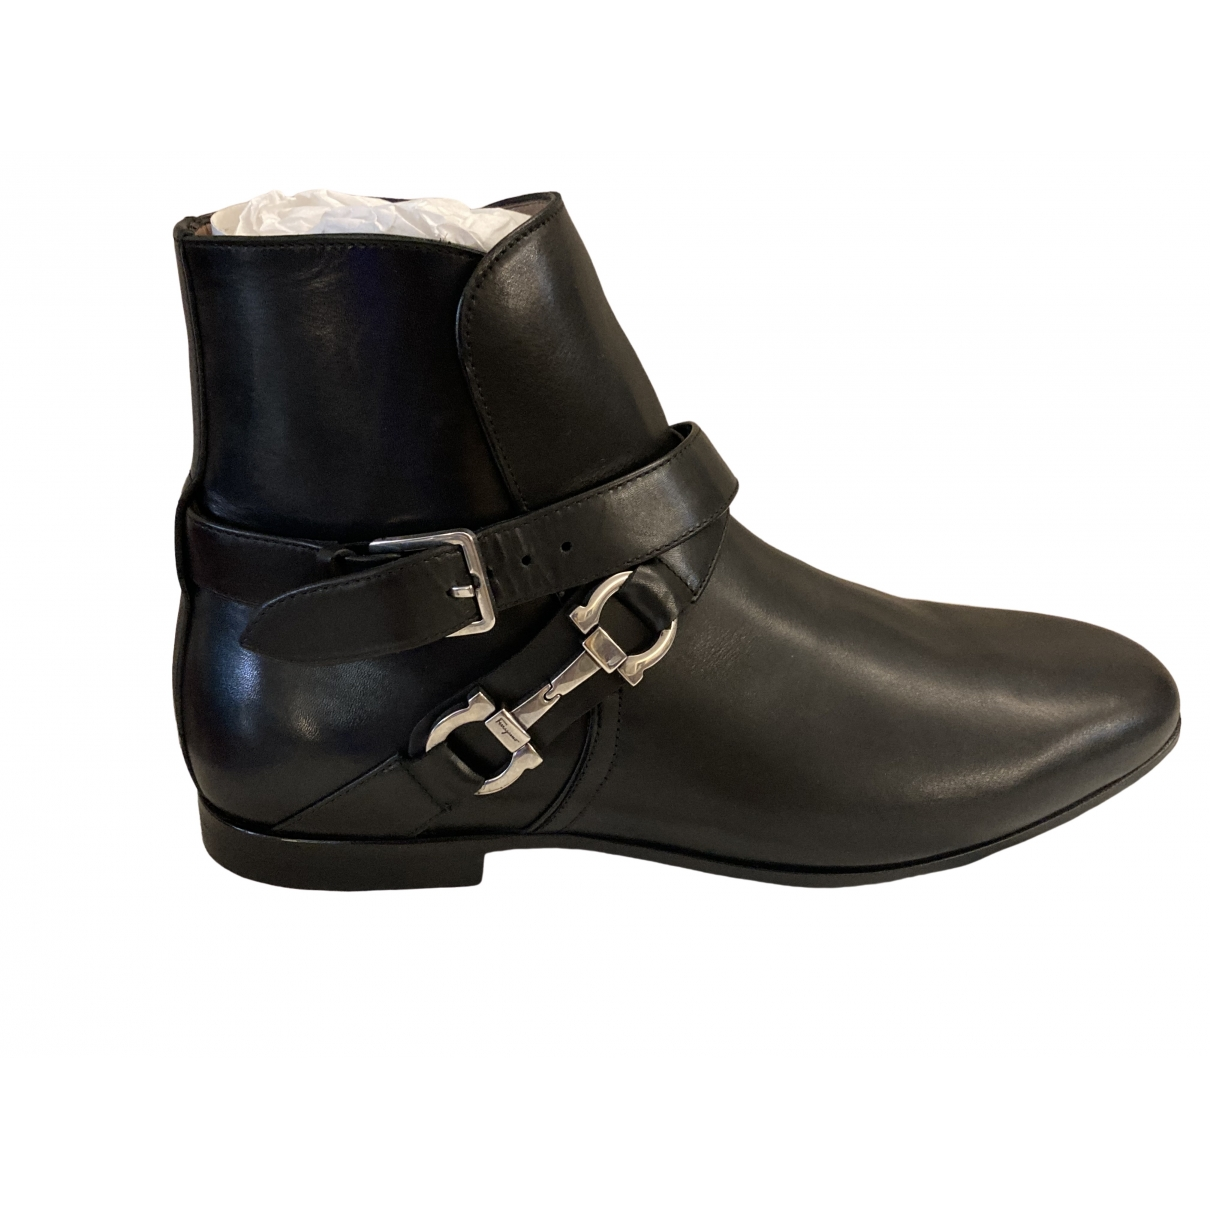 Salvatore Ferragamo \N Black Leather Boots for Men 6.5 UK